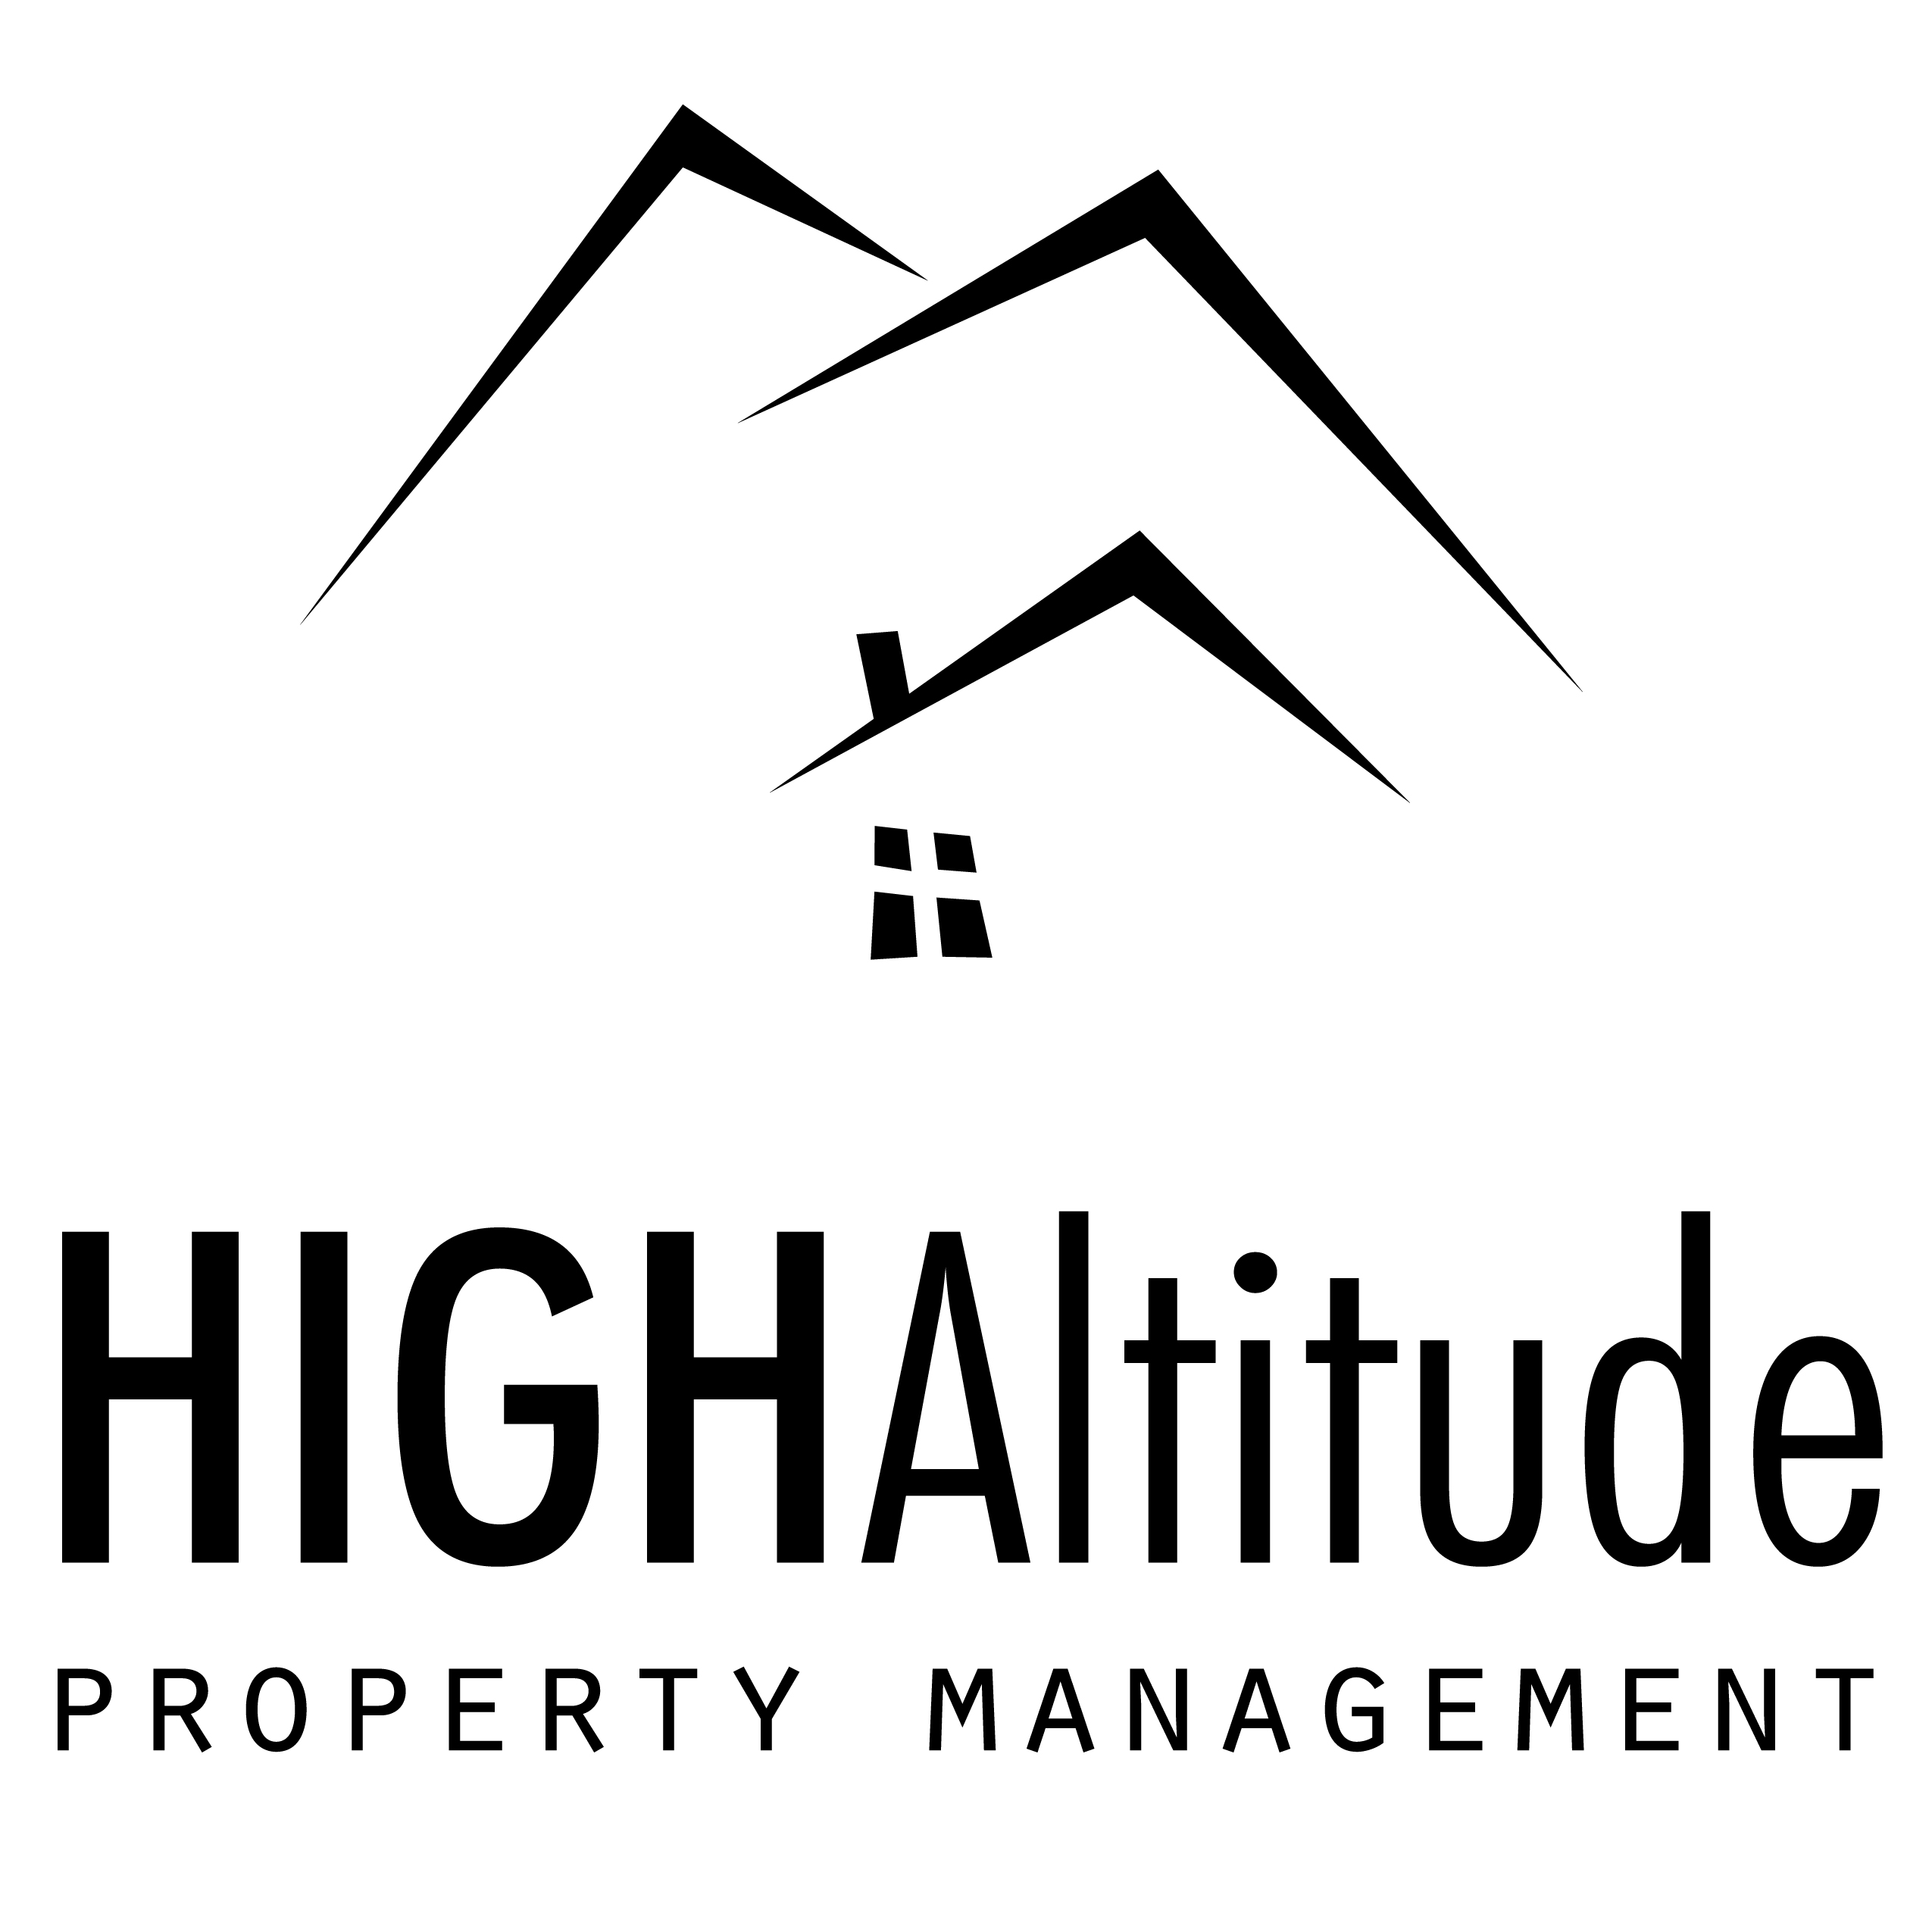 High Altitude Property Management's Logo